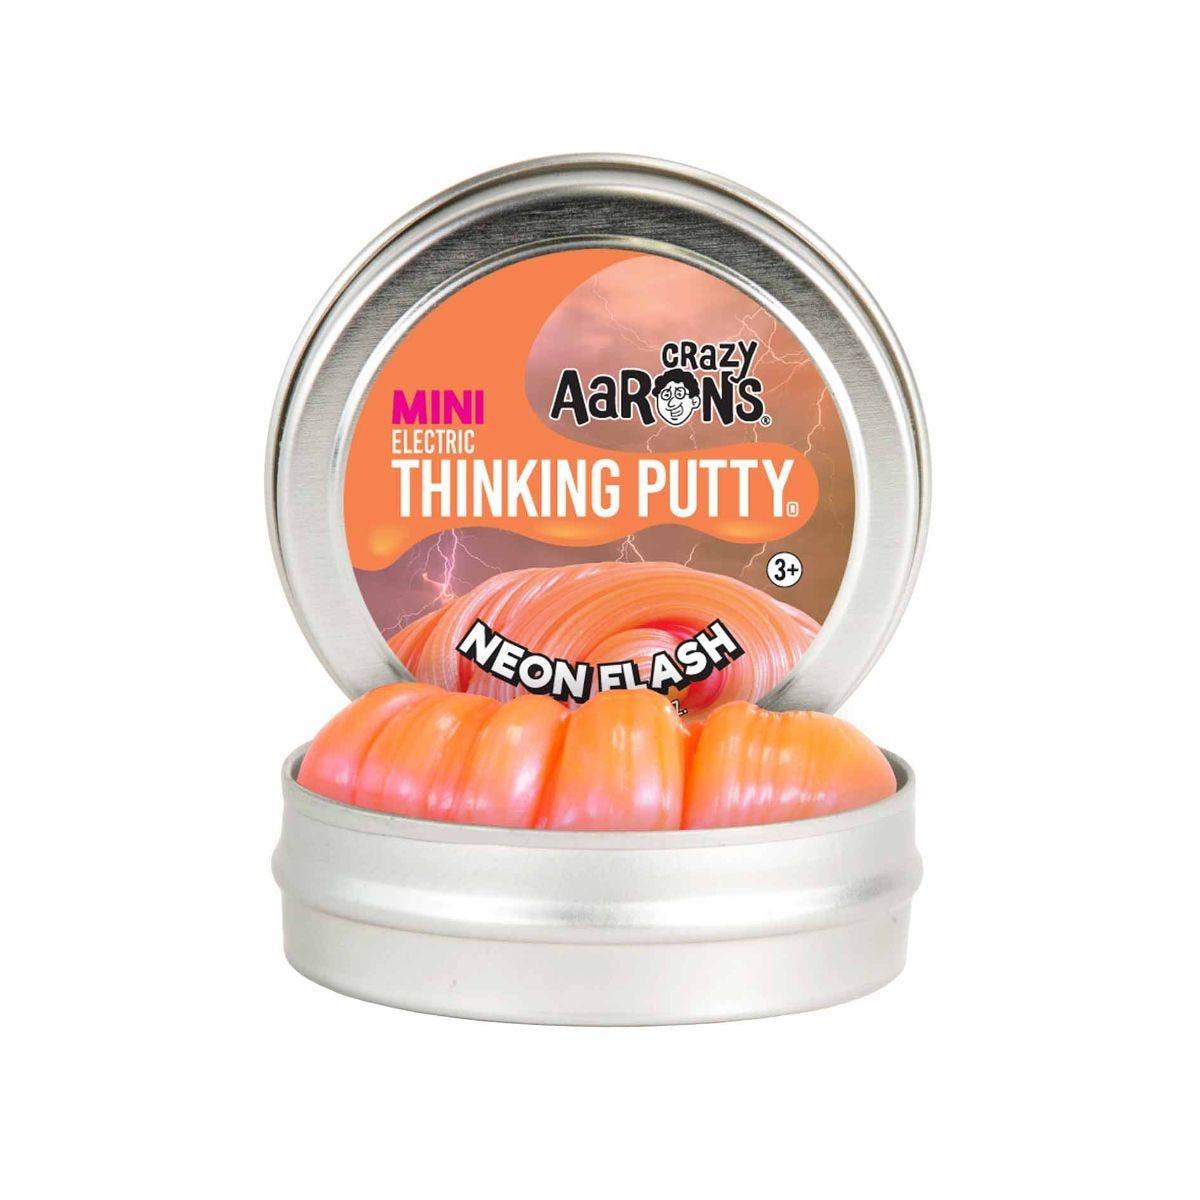 Crazy Aarons Thinking Putty Neon Flash Mini Tin